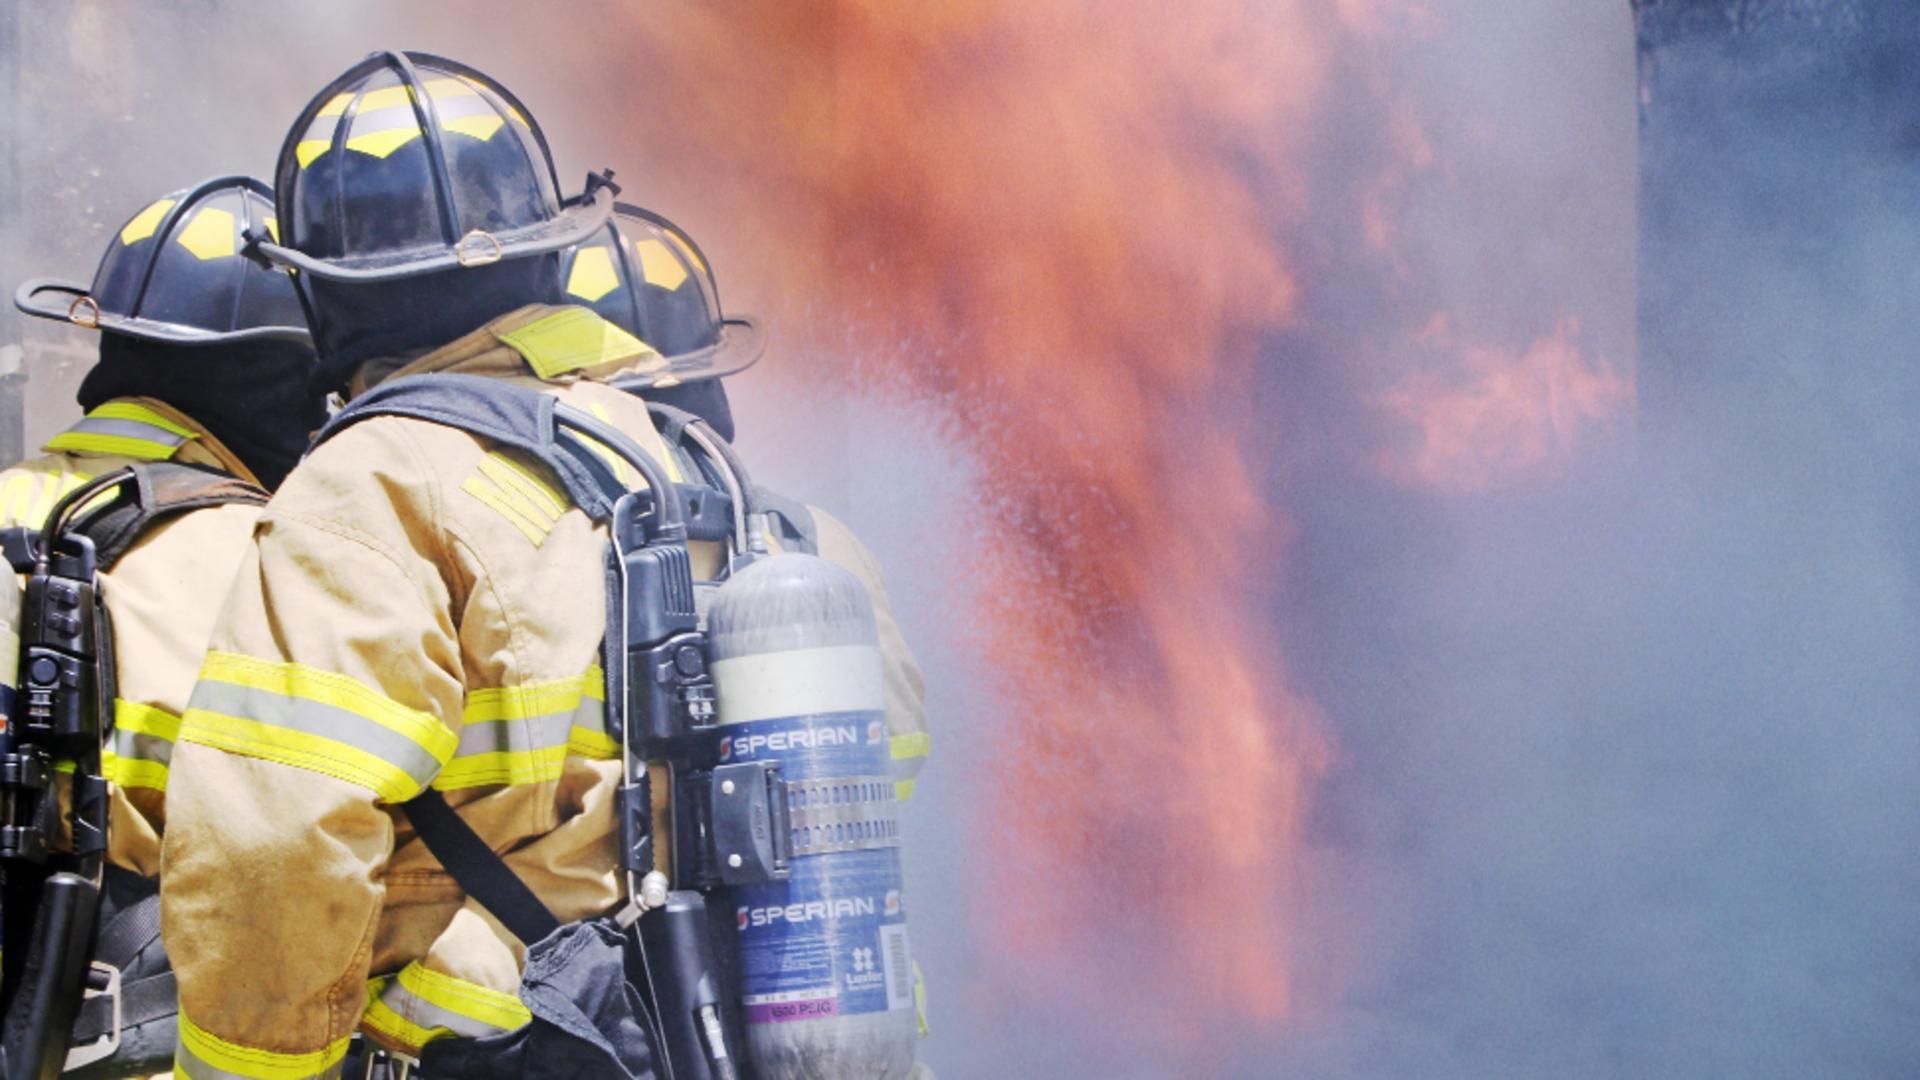 Incendiu puternic, în Brazilia. Foto: Pixabay